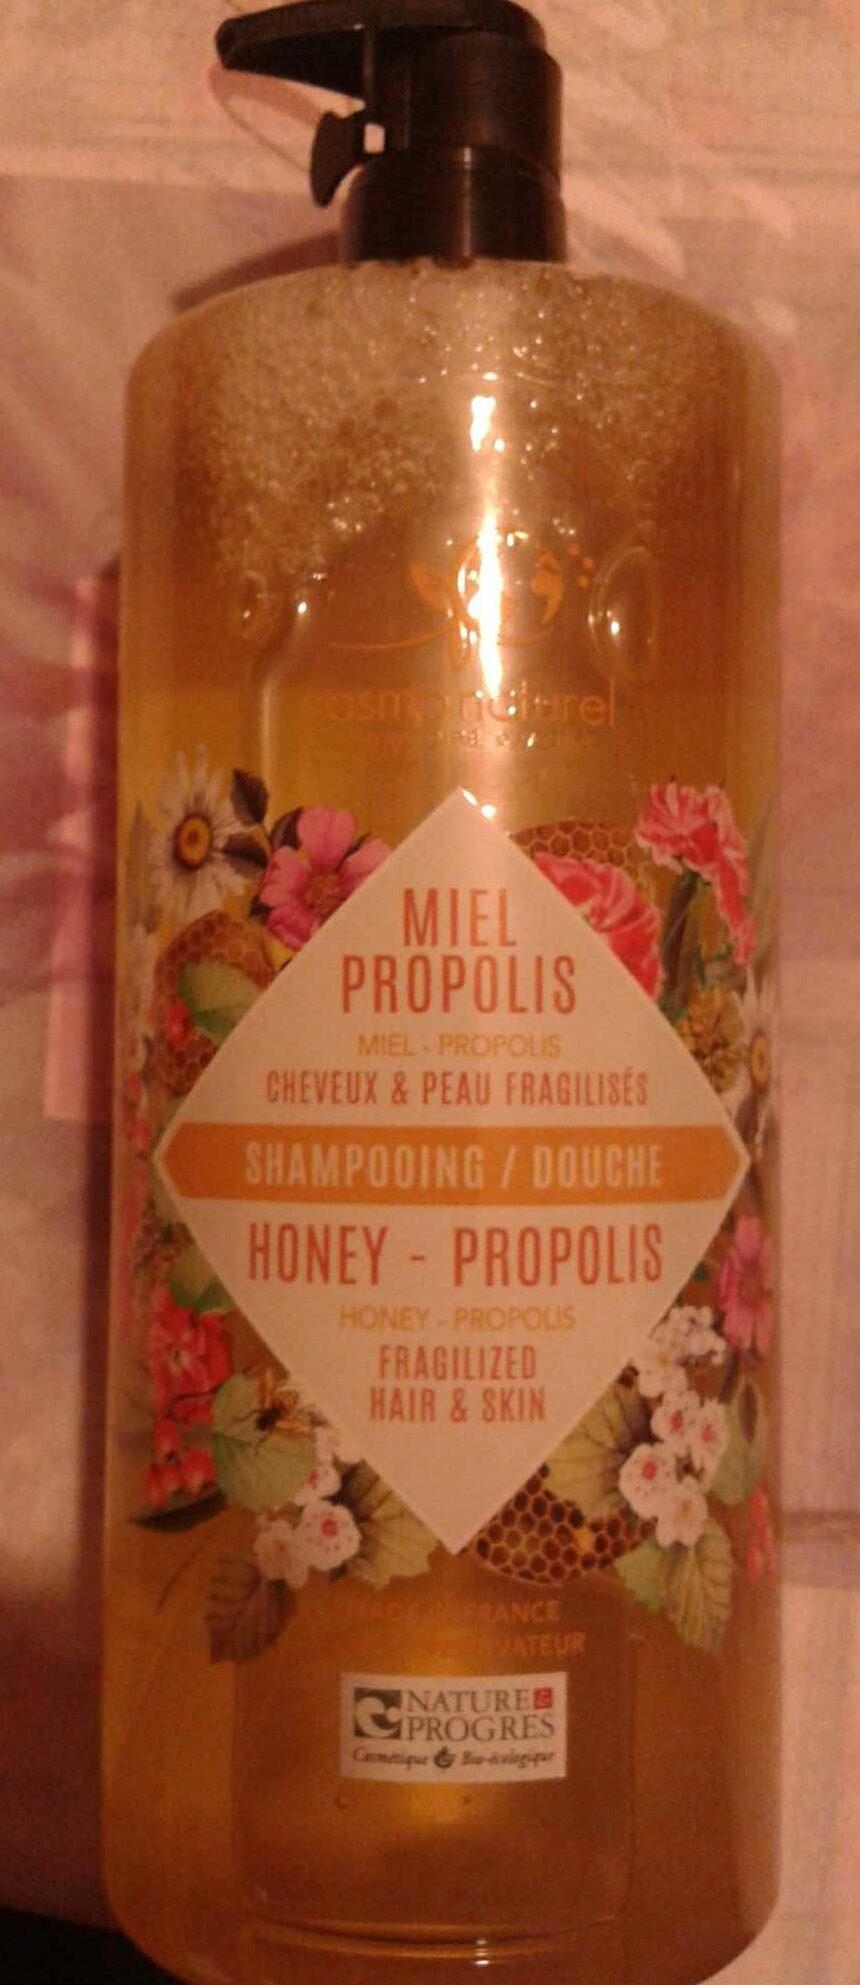 Shampooing Douche Miel Propolis - Product